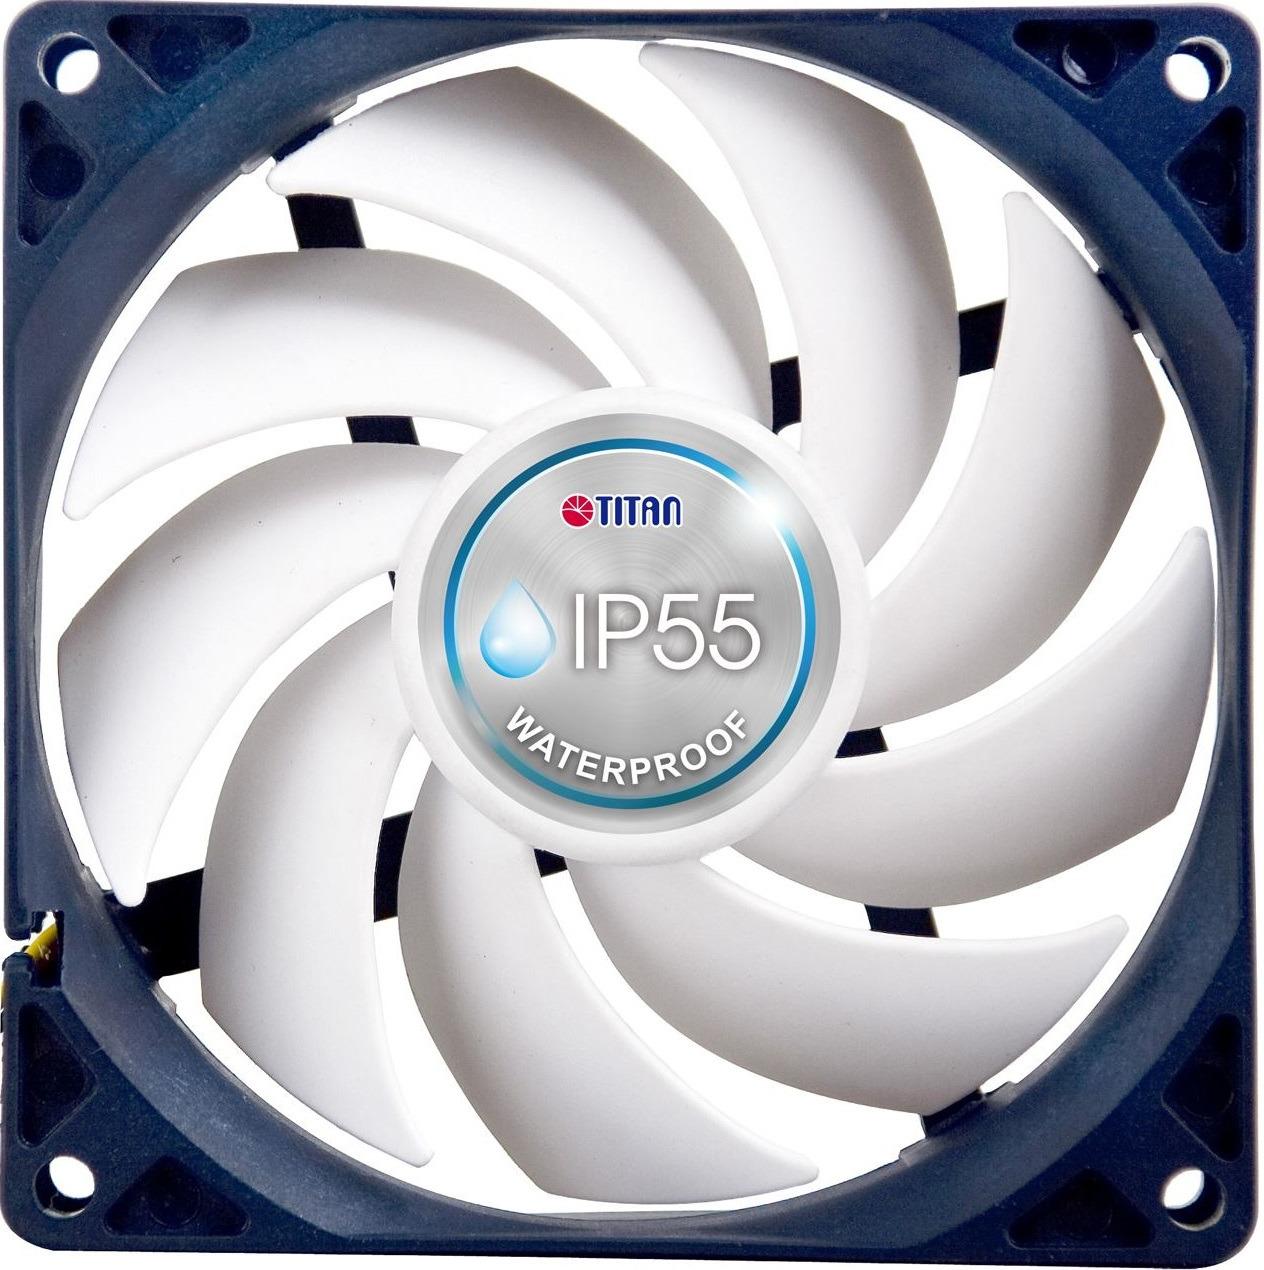 Вентилятор компьютерный Titan, TFD-14025H12B/KW(RB), белый, серый вентилятор мощный